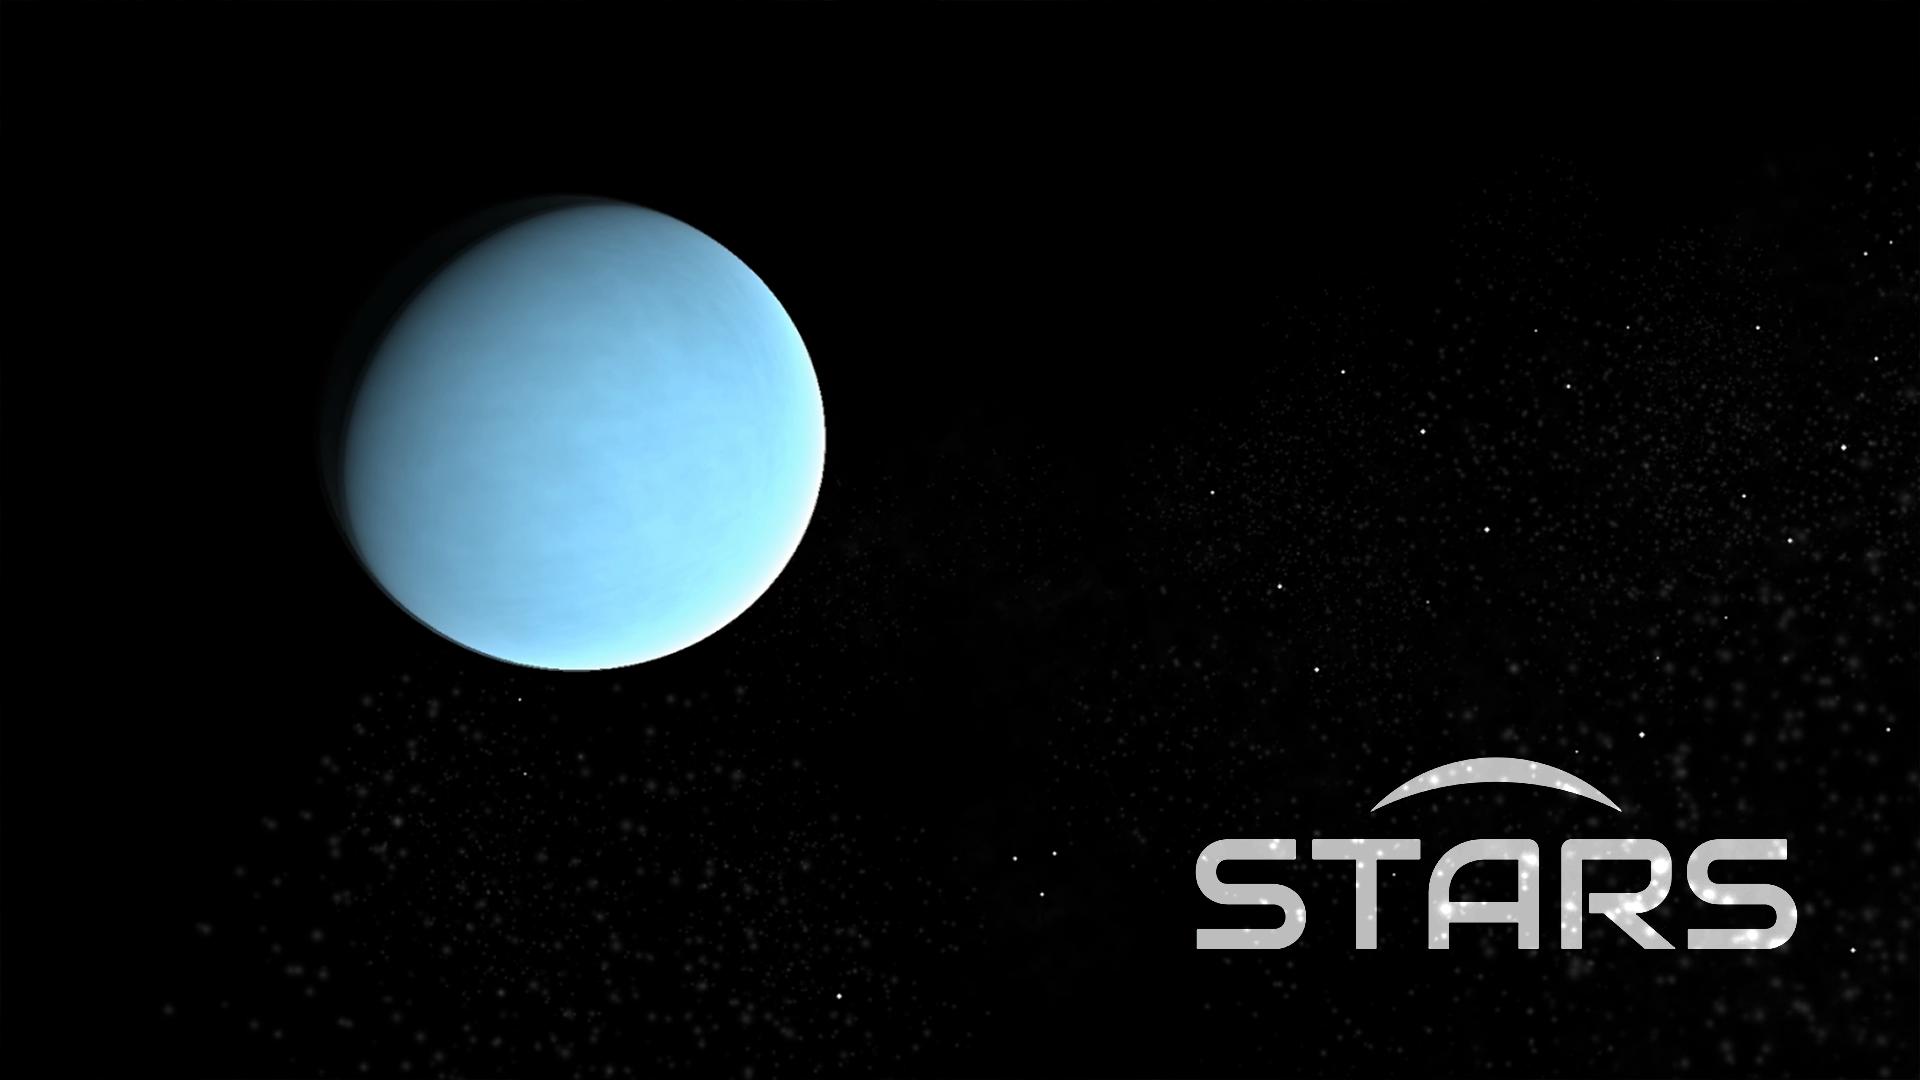 Stars - Gas Giant